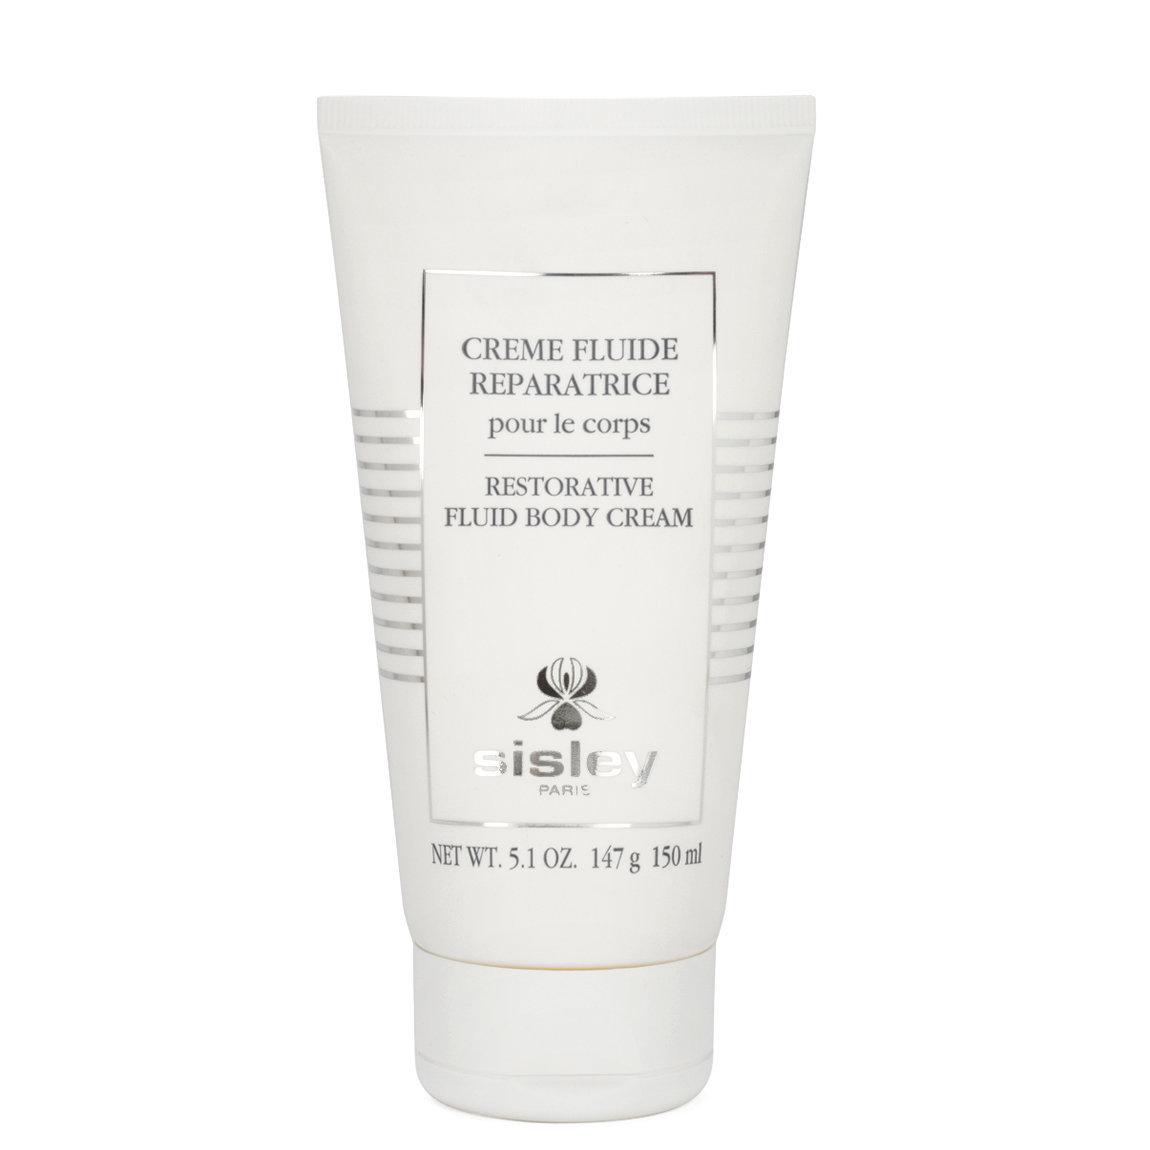 Sisley-Paris Restorative Fluid Body Cream alternative view 1 - product swatch.